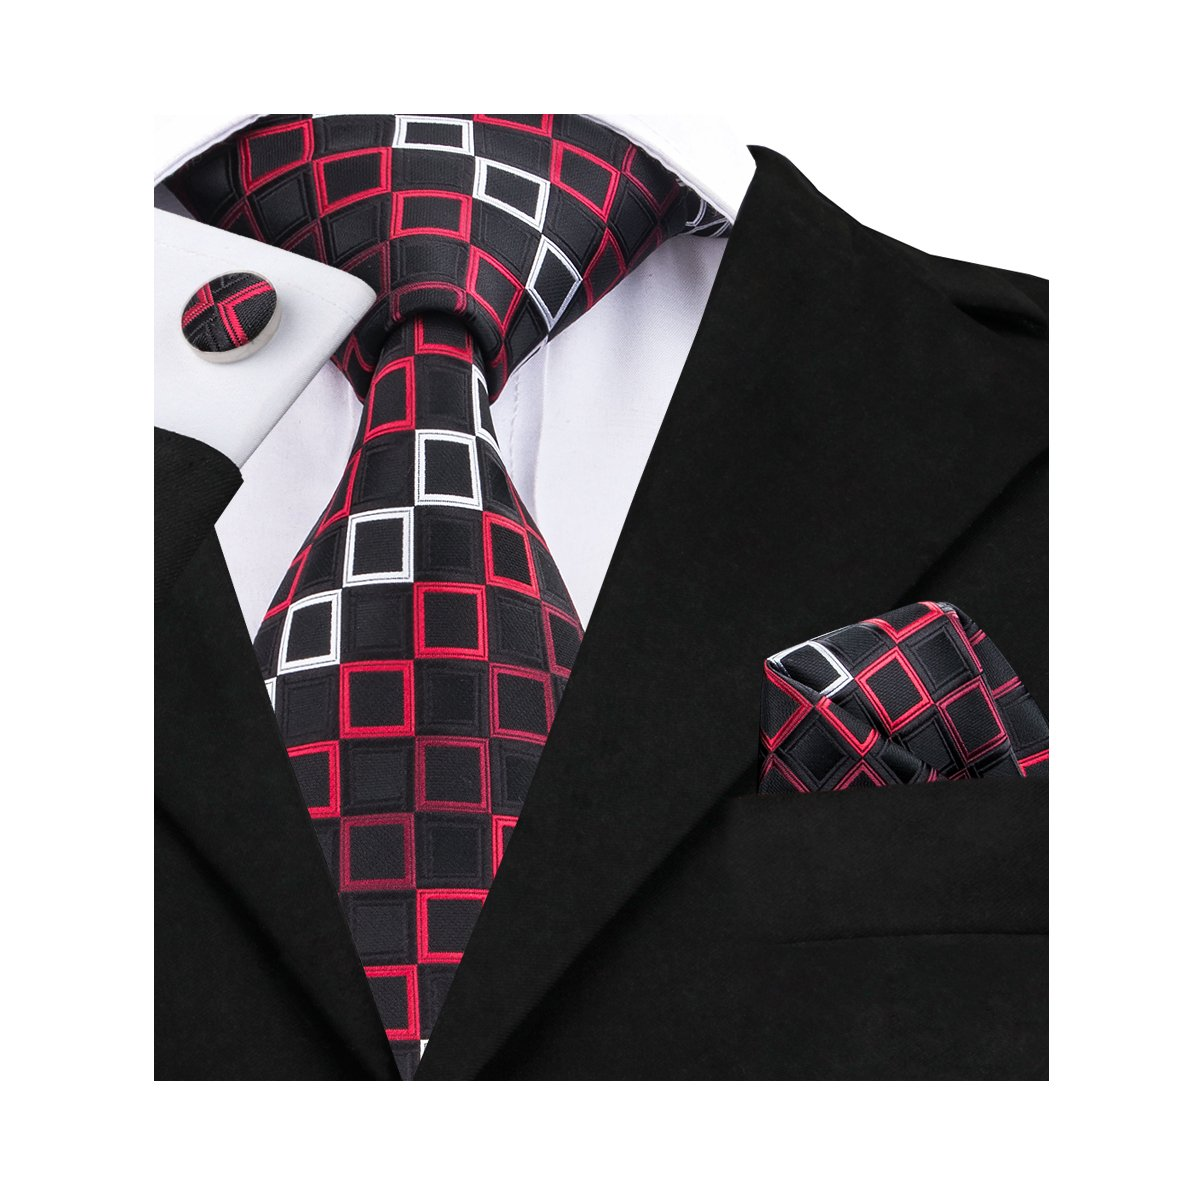 Barry.Wang Black Ties Woven Necktie Handkerchief Cufflinks Set Formal Black 1 One Size FBABARRY-258